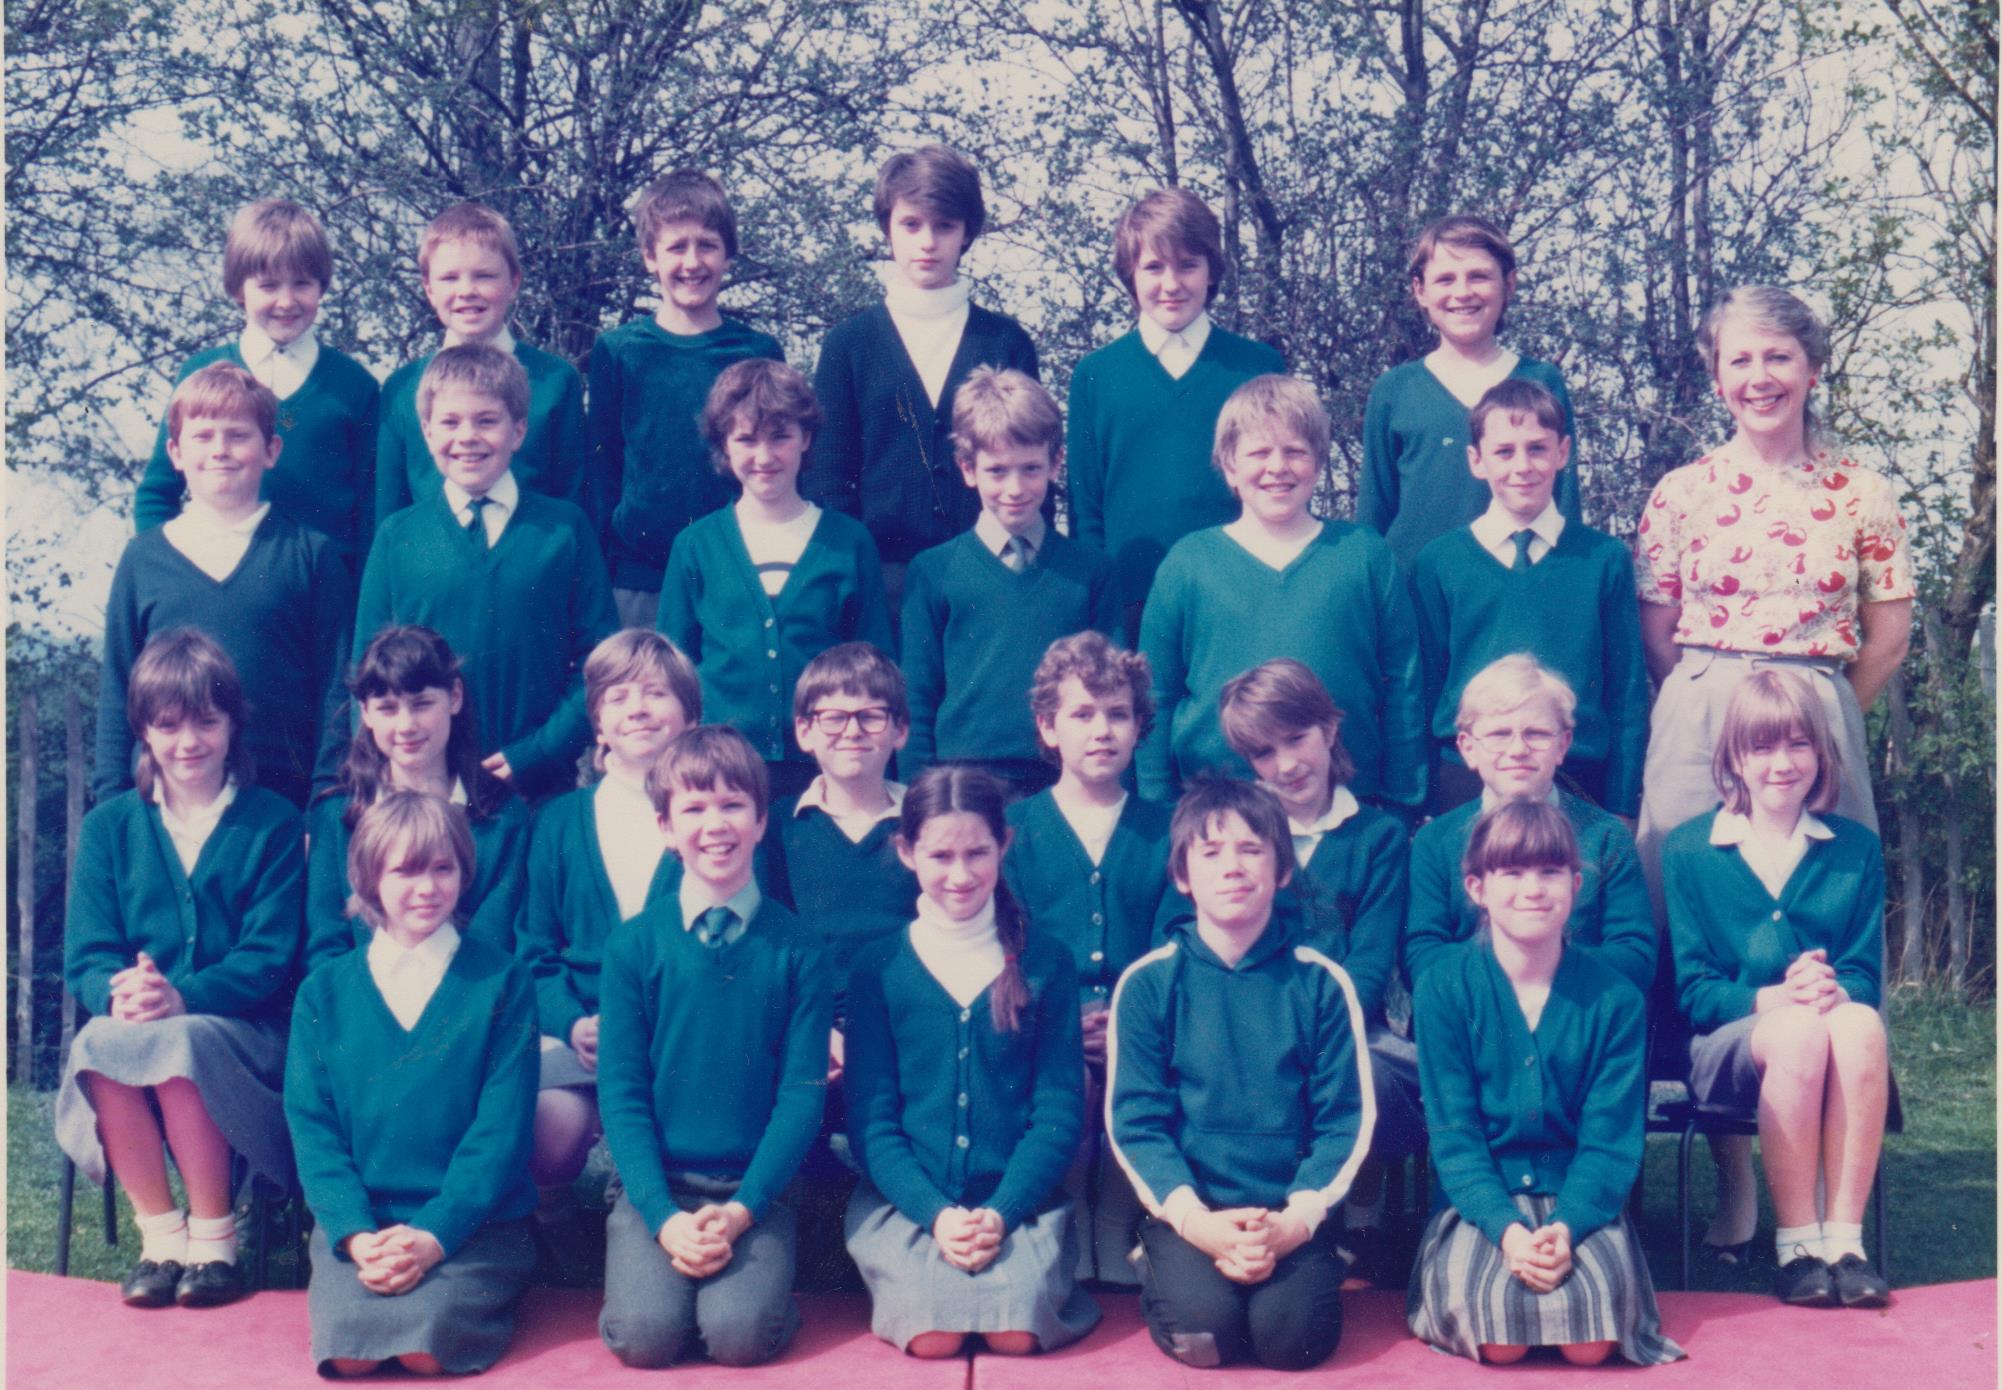 schoolgroup_c_1984_sandra_price_001.jpg